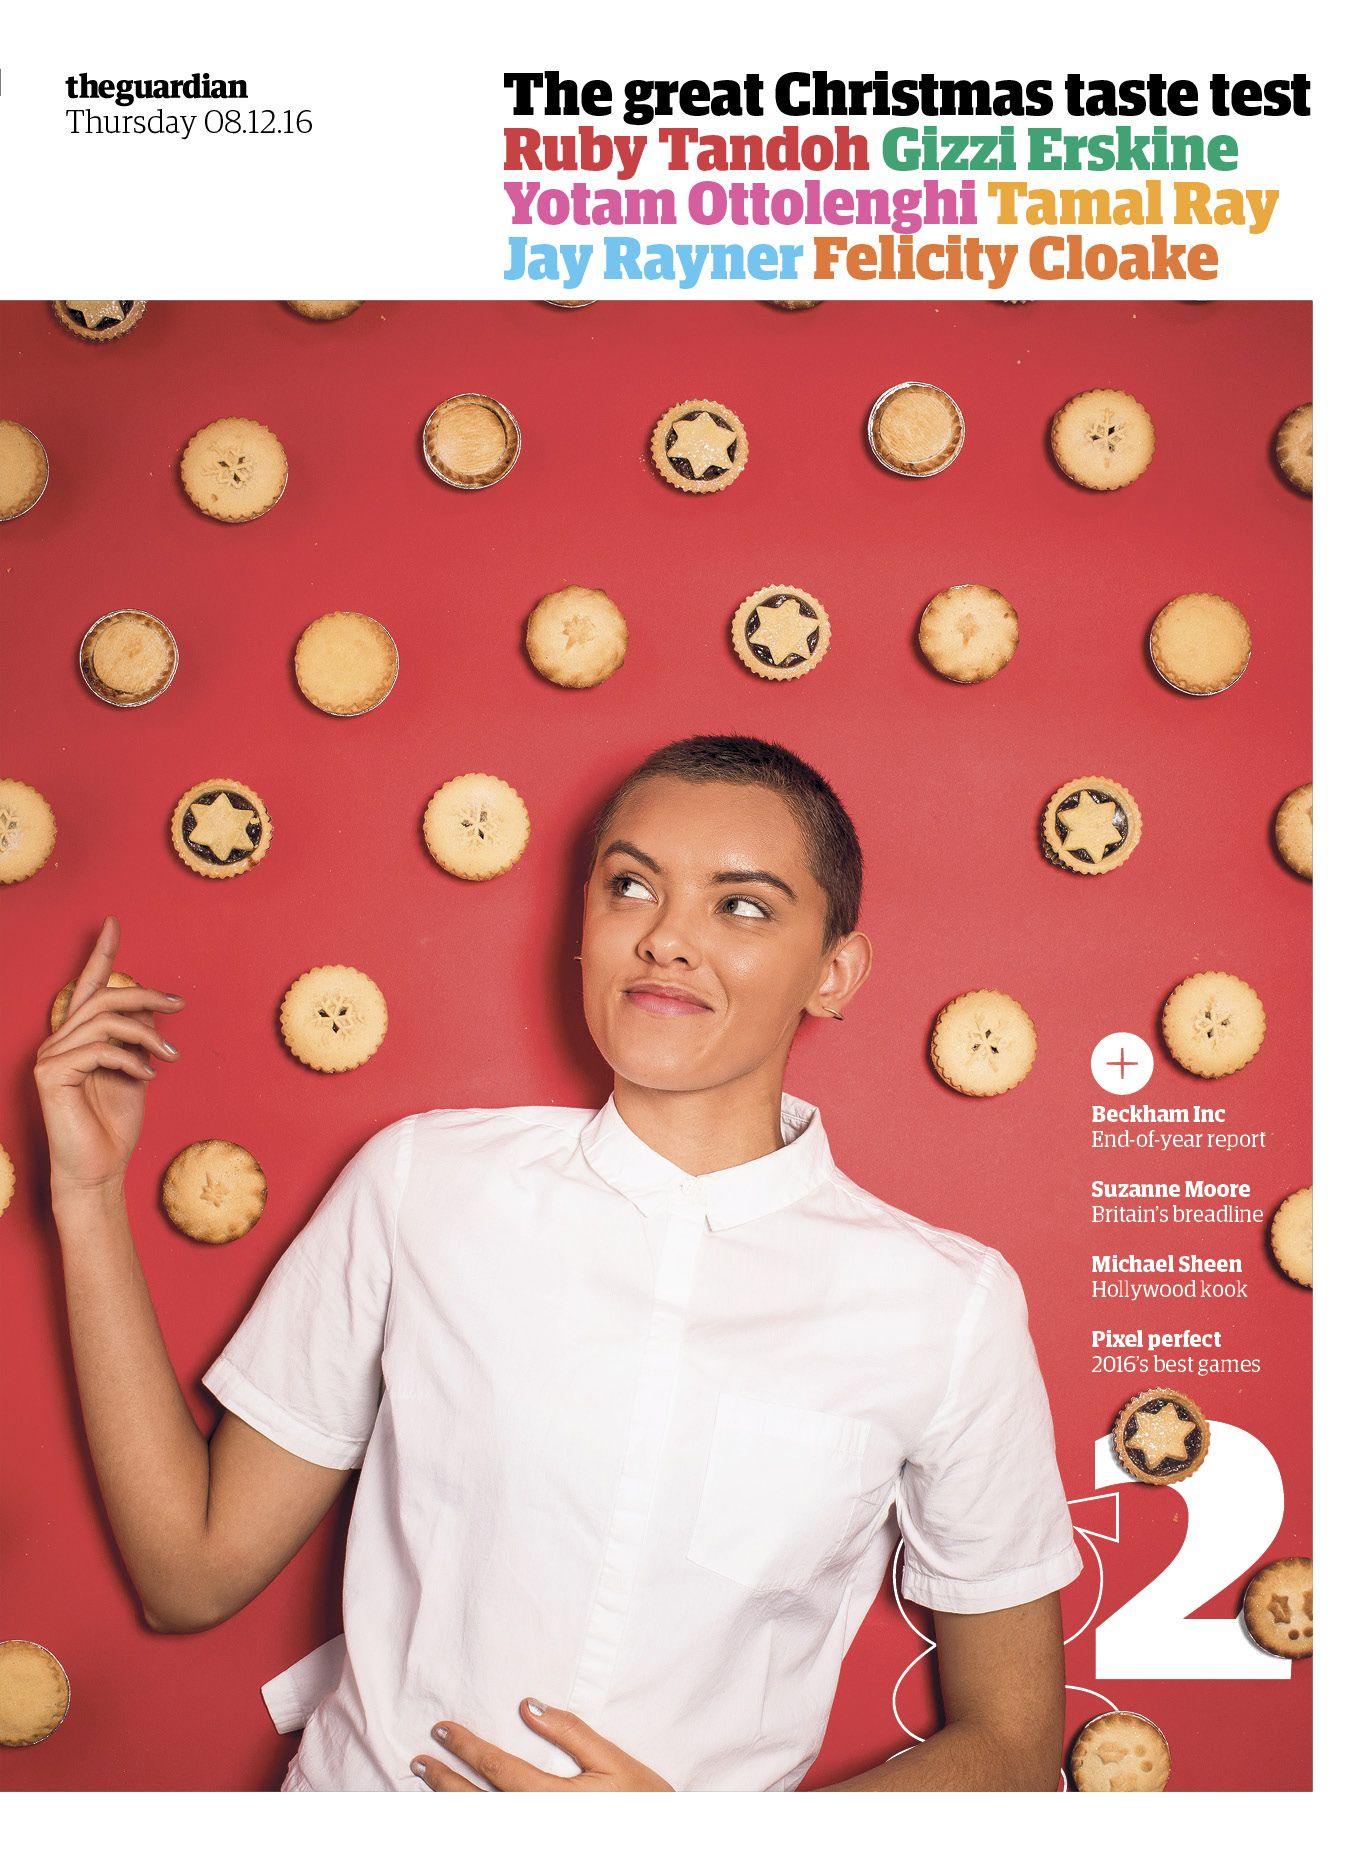 #editorialdesign #newspaperdesign #graphicdesign #design #theguardian Guardian g2 cover